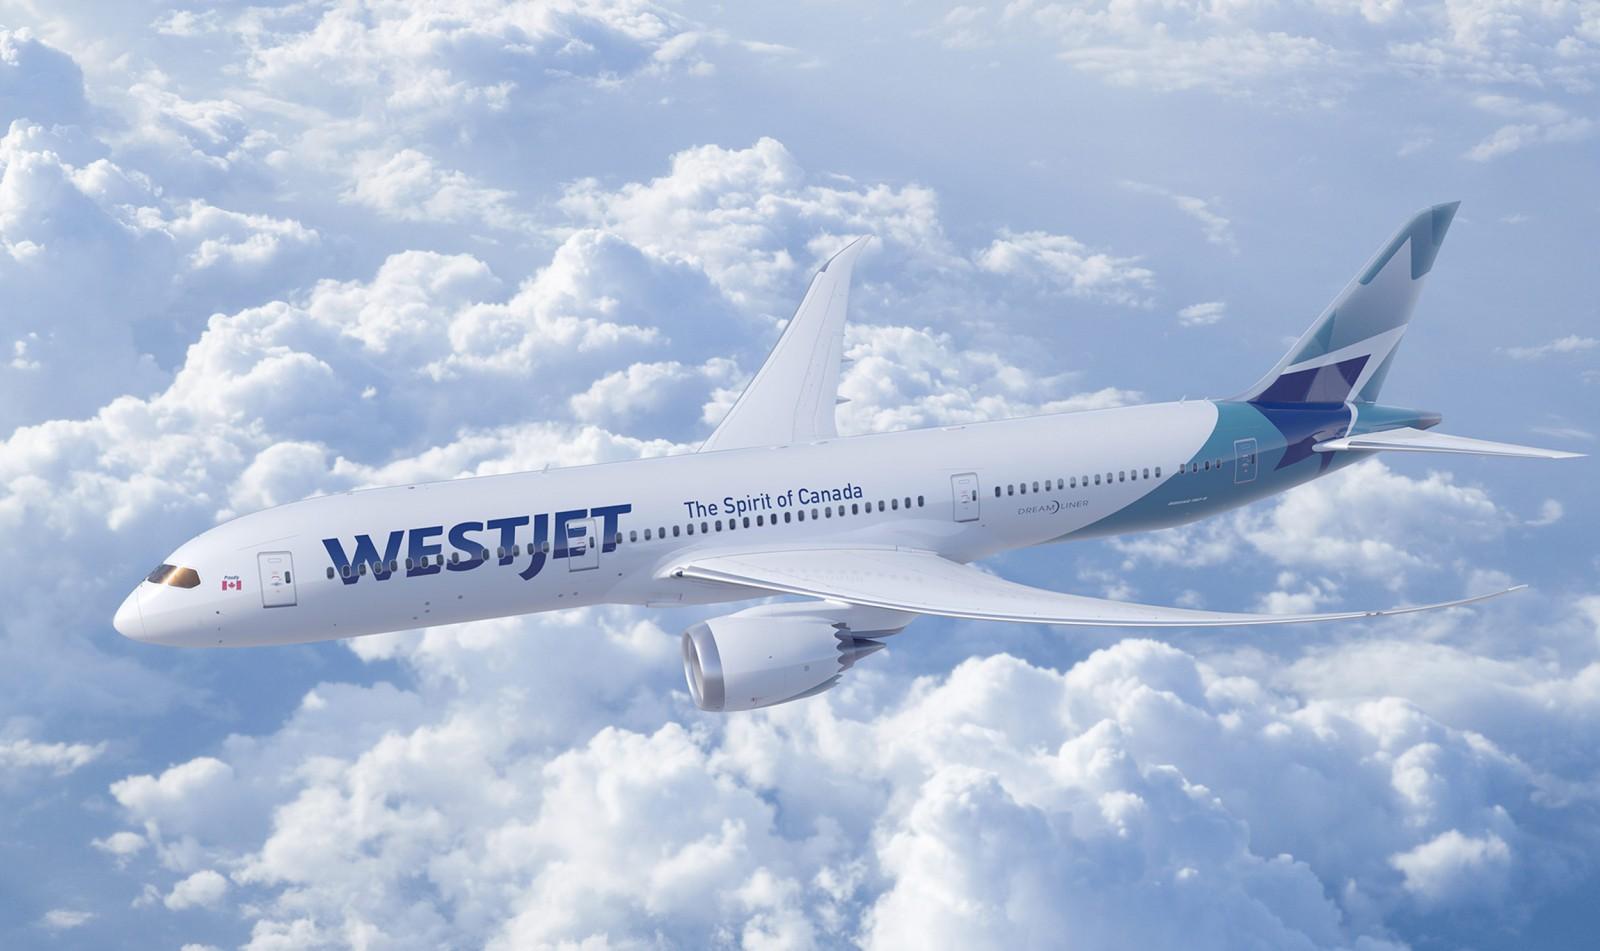 WestJet 787 aircraft